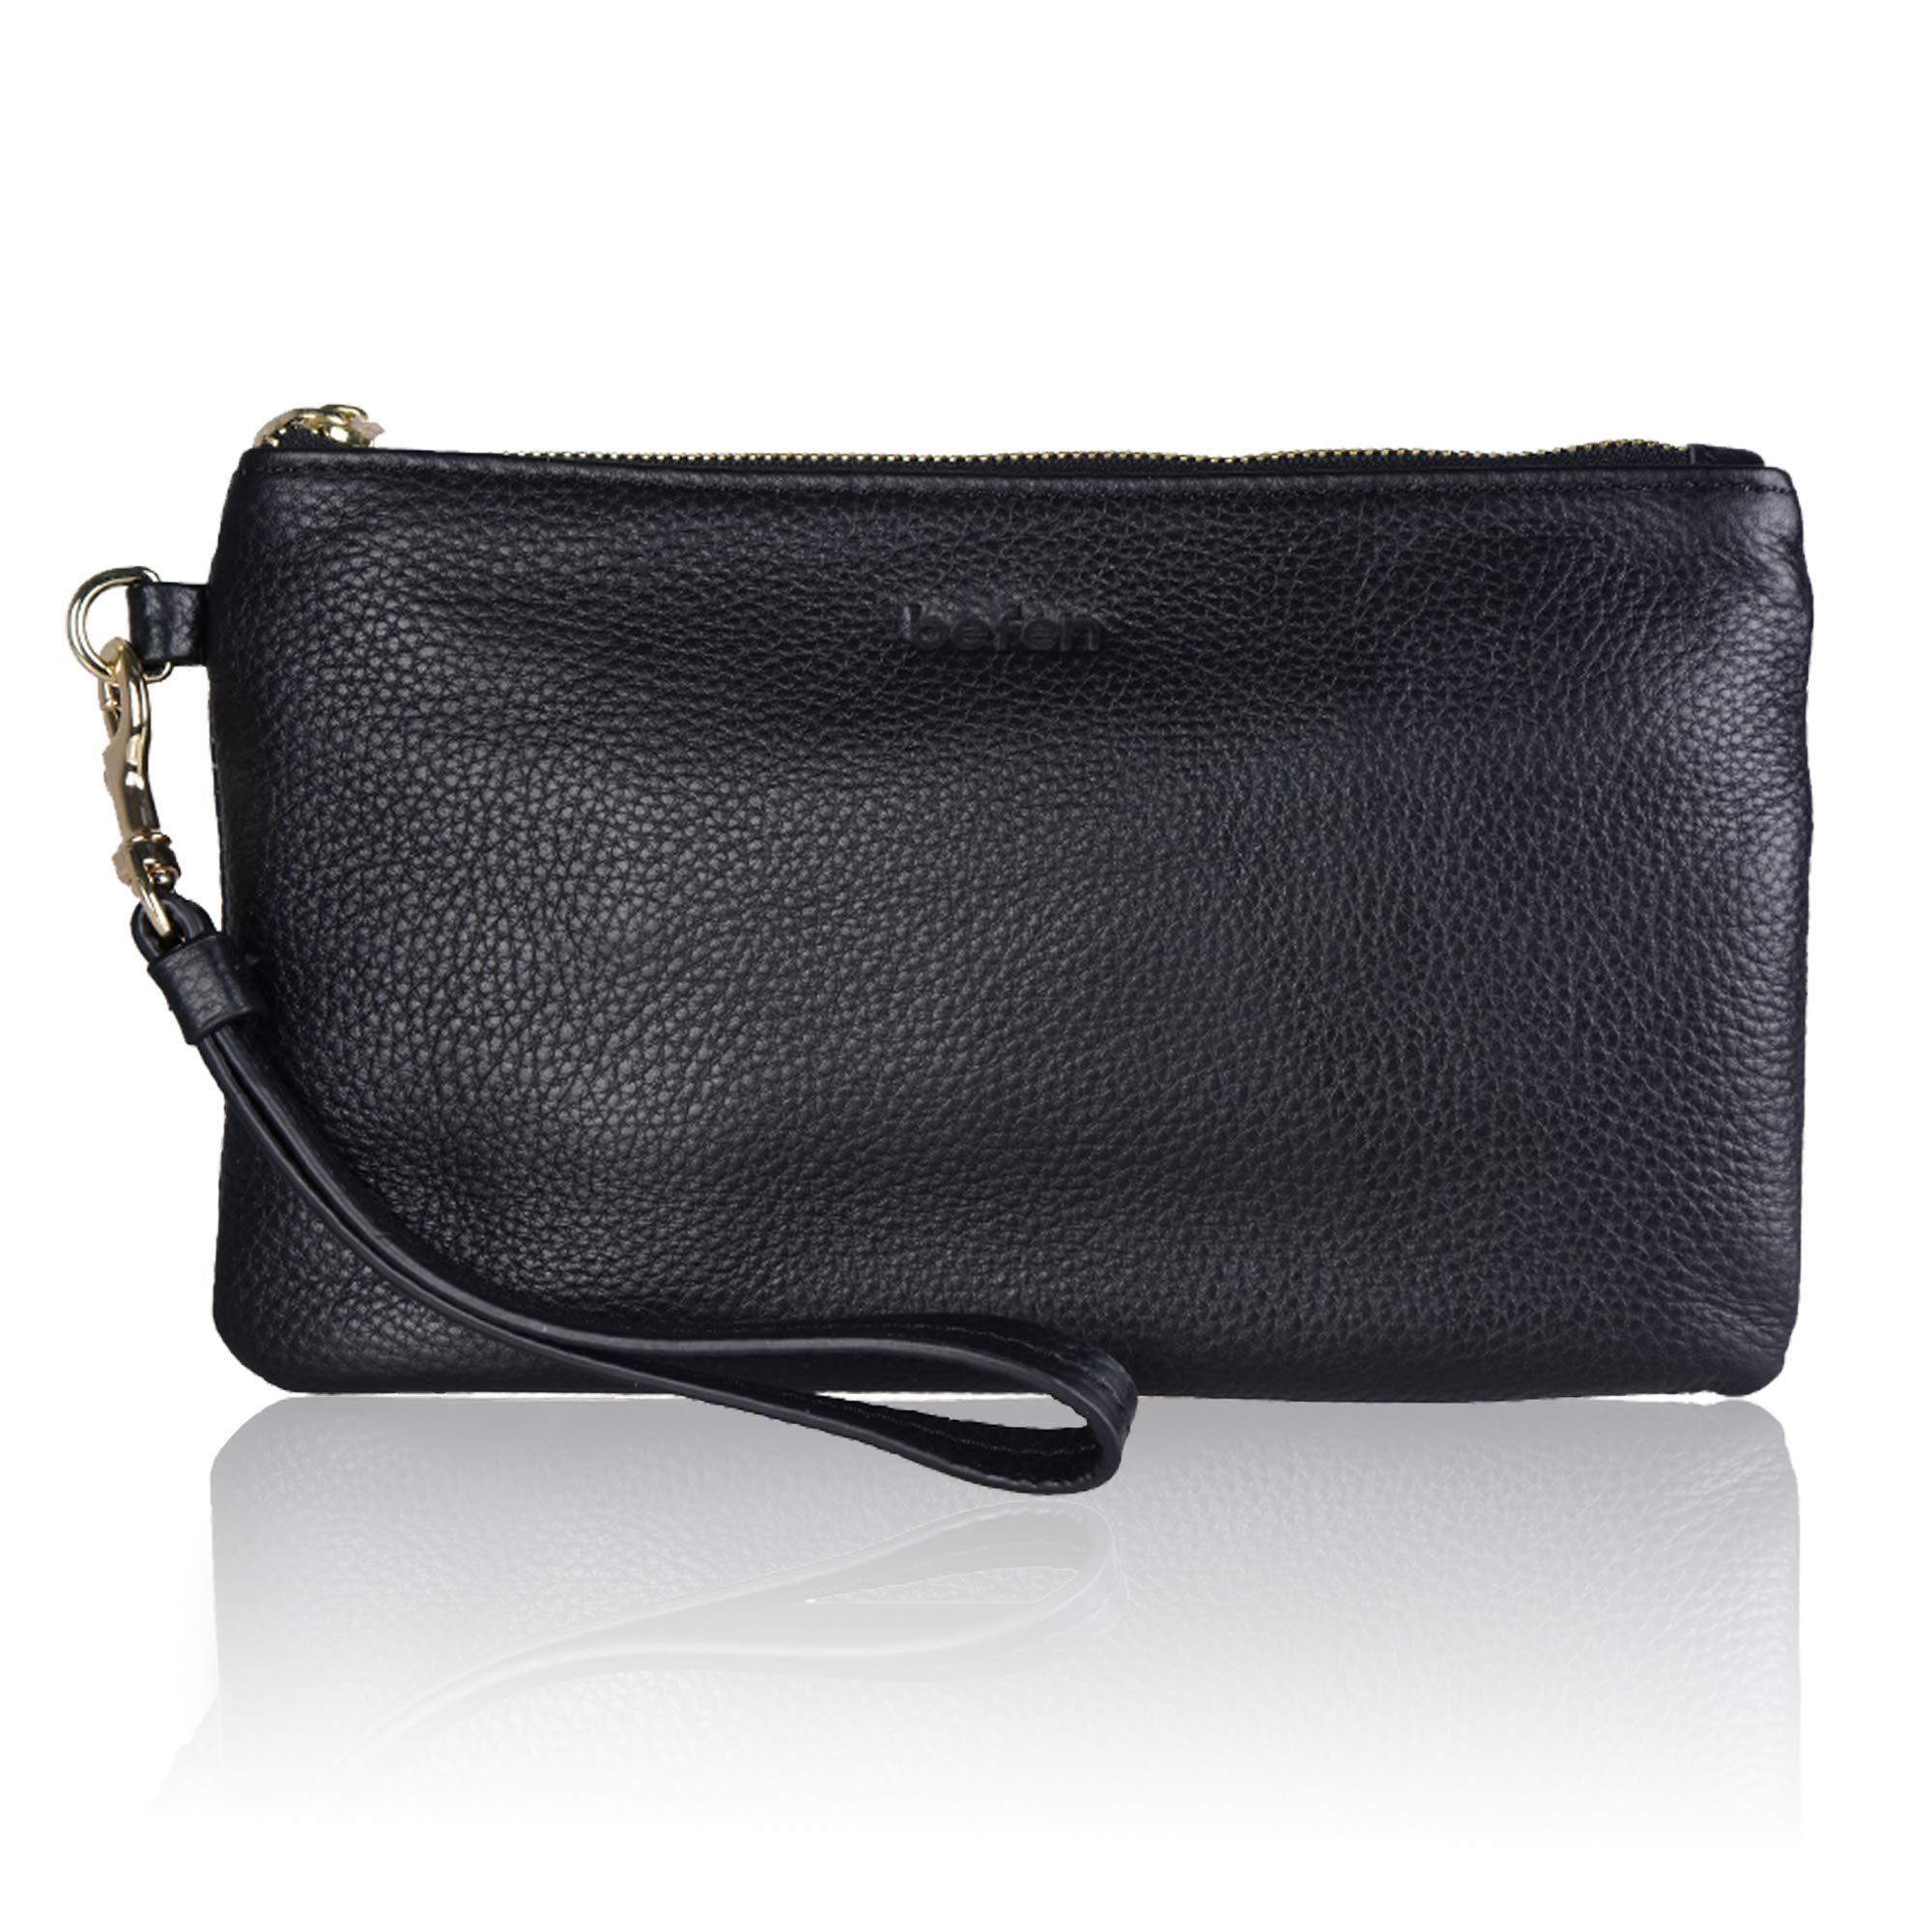 Befen Genuine Leather Smartphone Wristlet